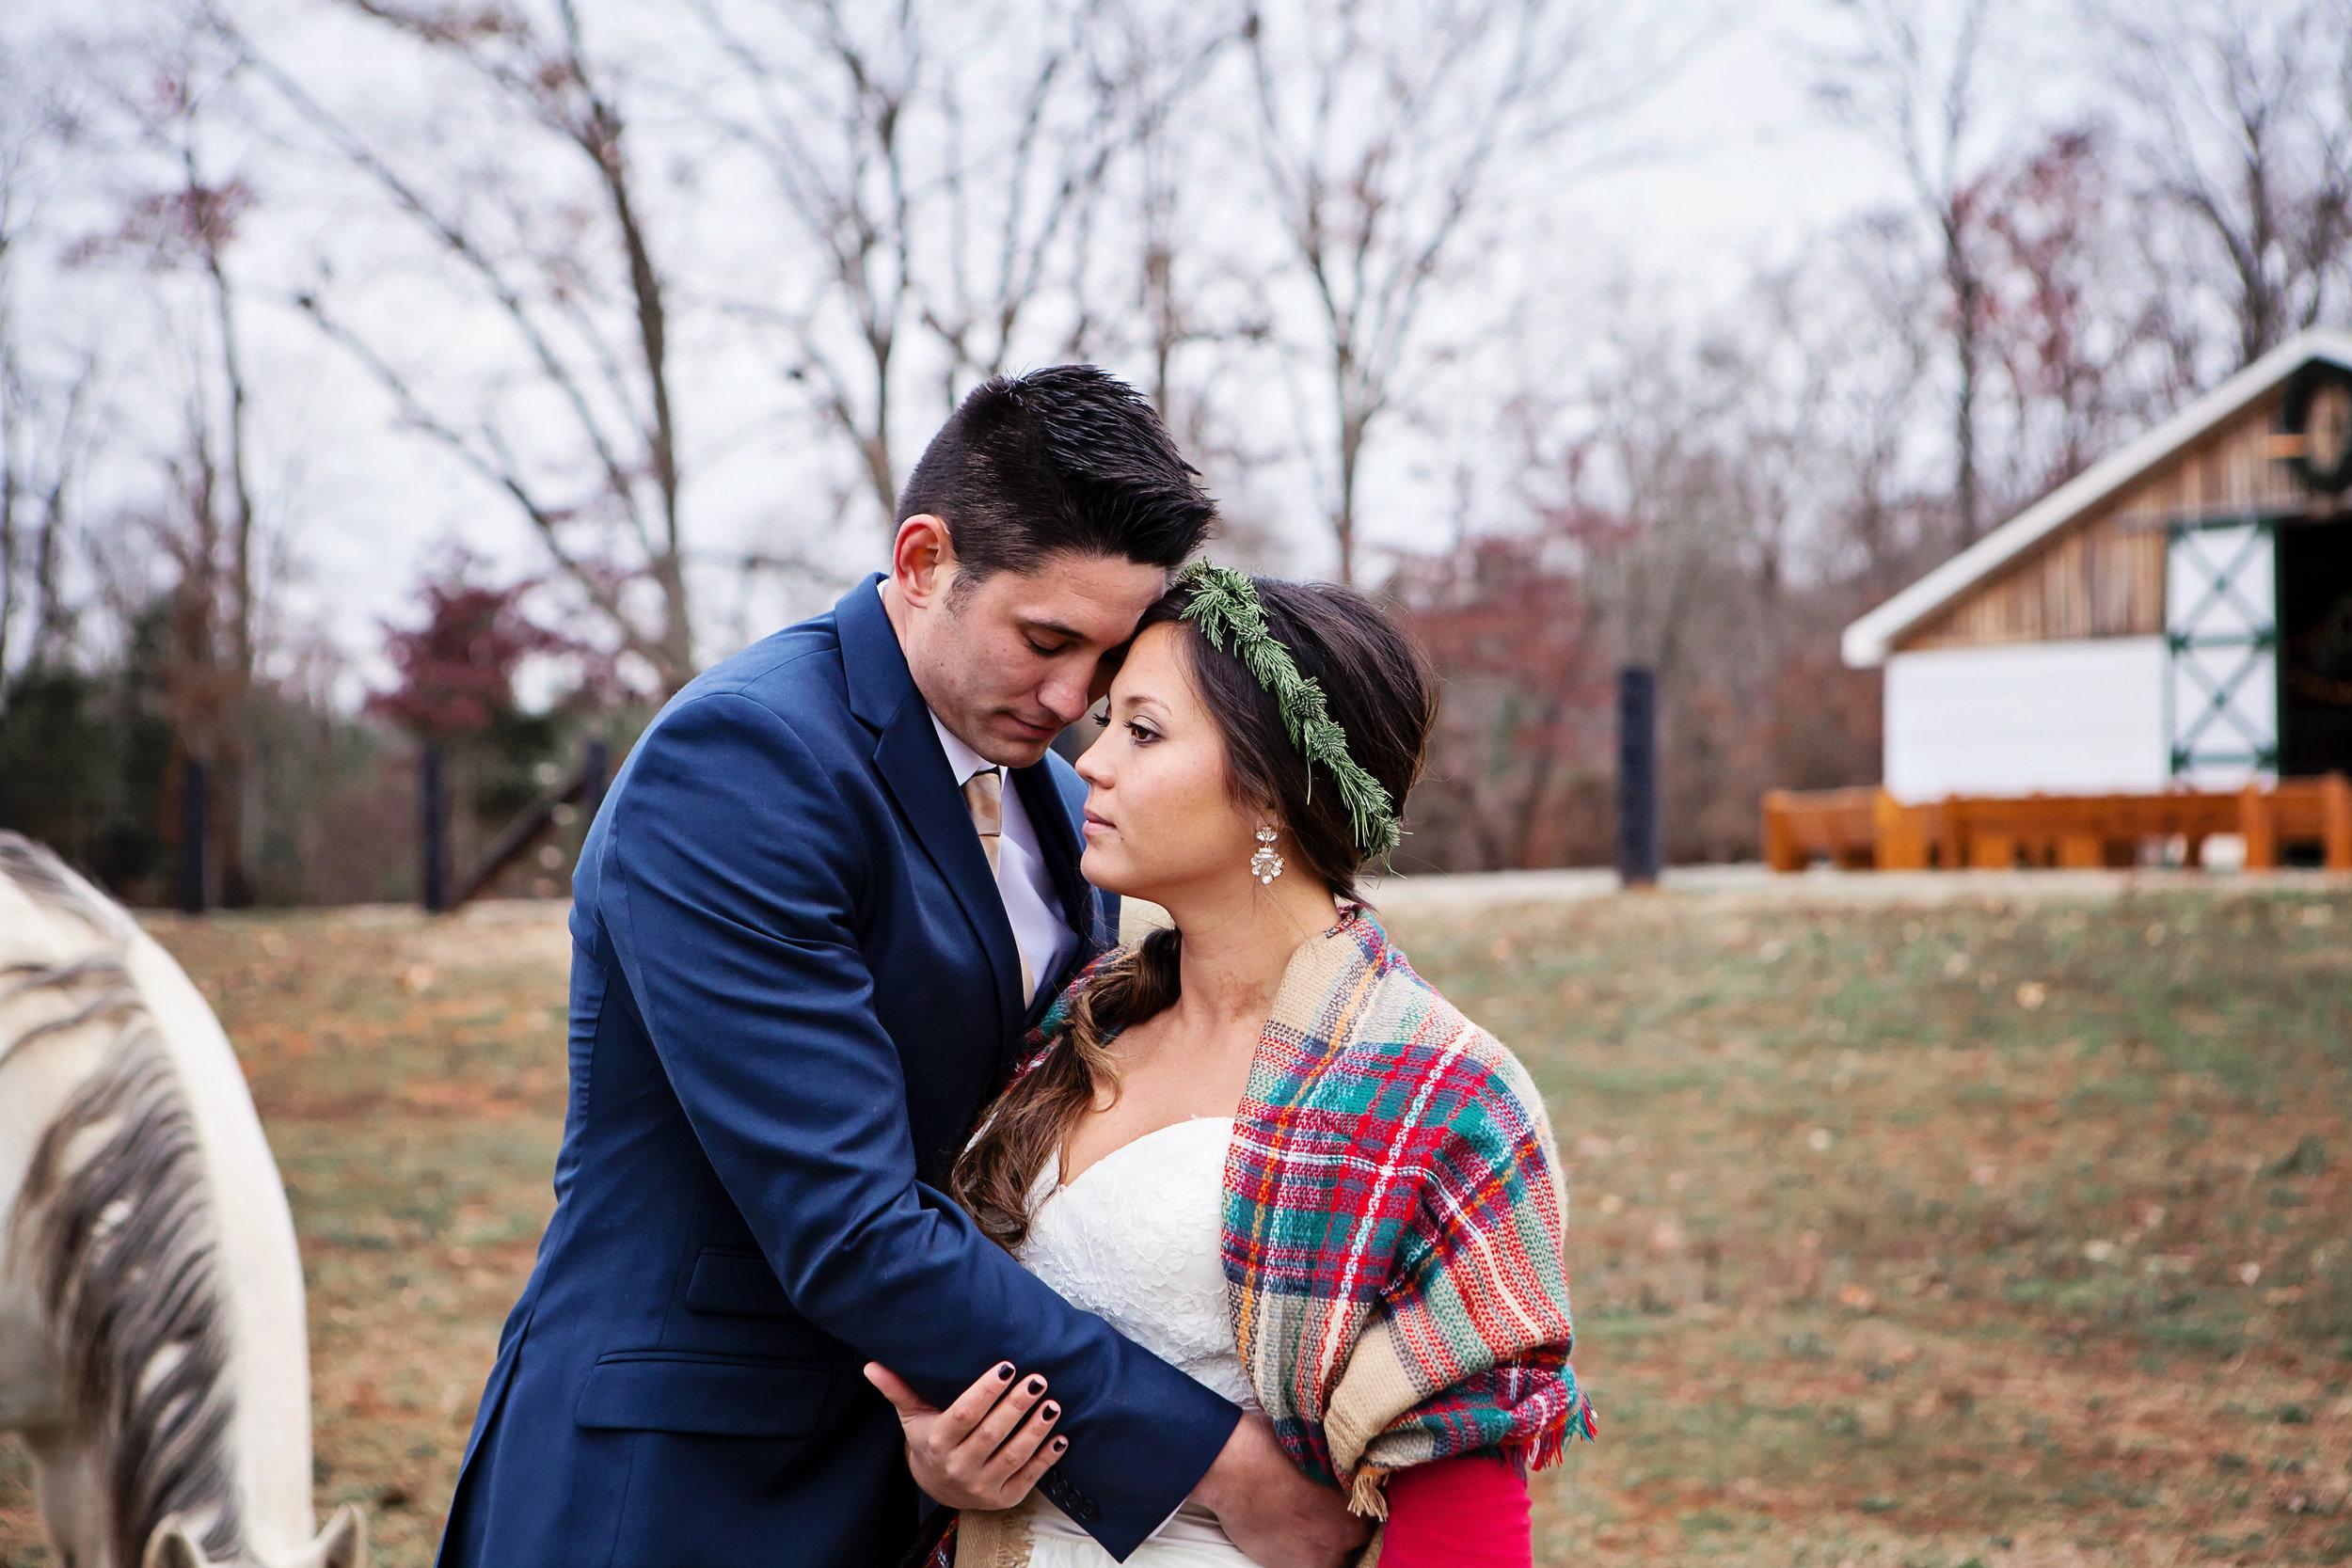 A Cozy Winter Farm Wedding - Megan White Photography - 13 Cedar Events